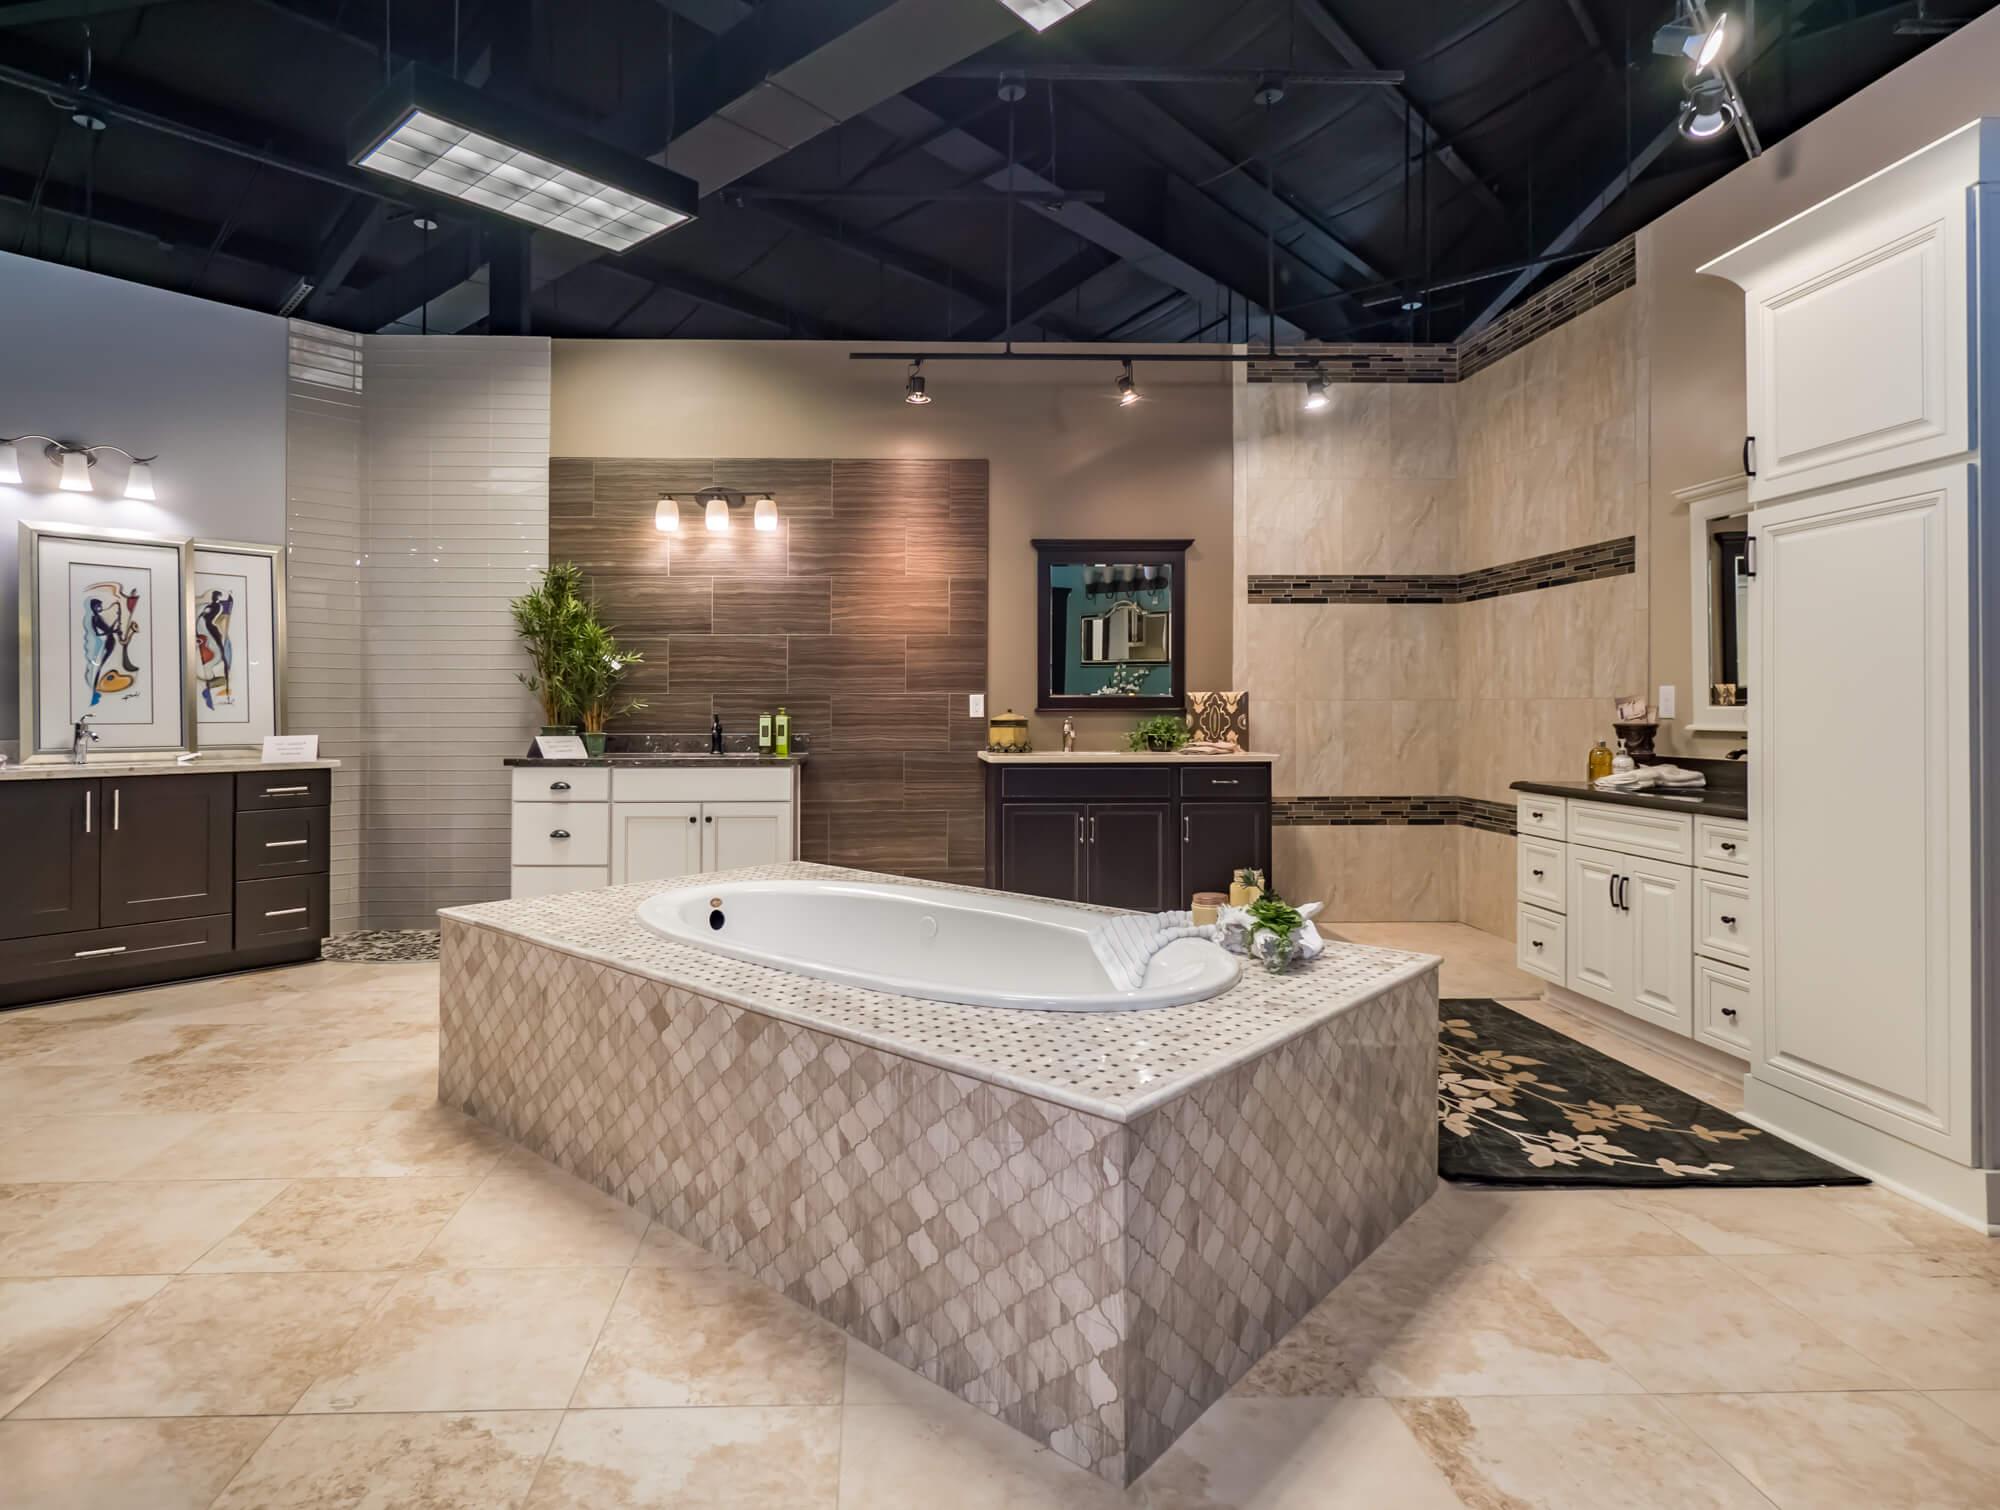 Bathroom Remodel - Woodsman Kitchens and Cabinets